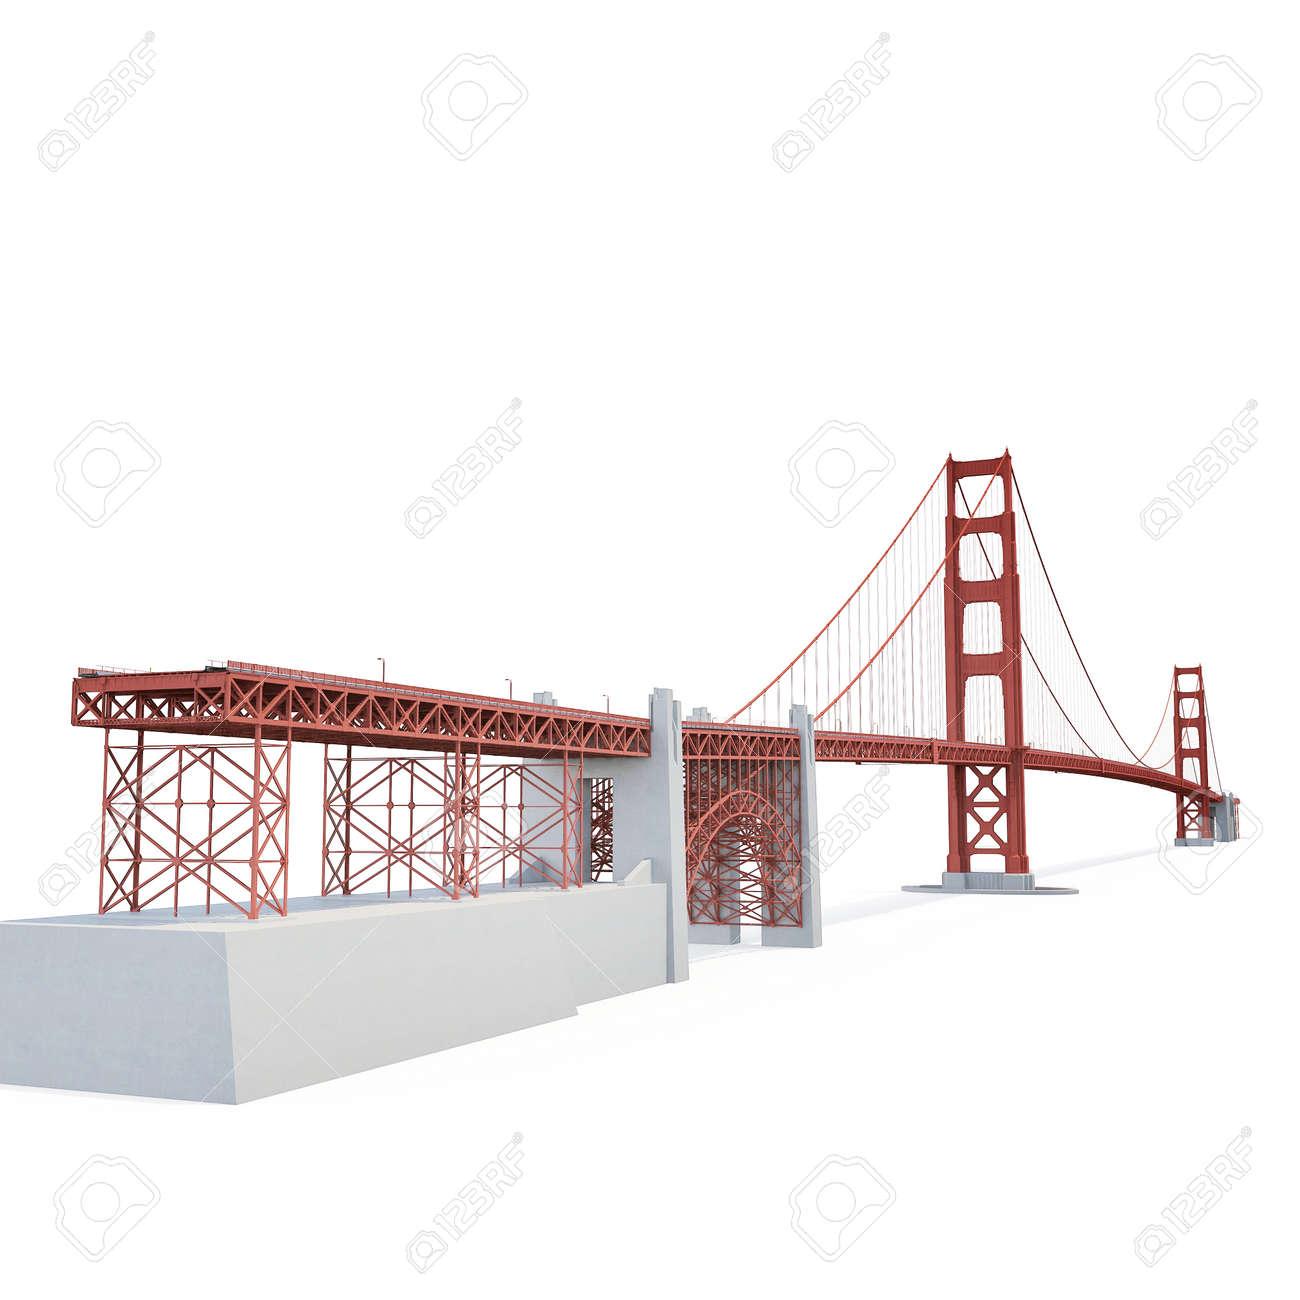 Golden Gate Bridge On White Background 3d Illustration Stock Photo Diagram Of The 81303450